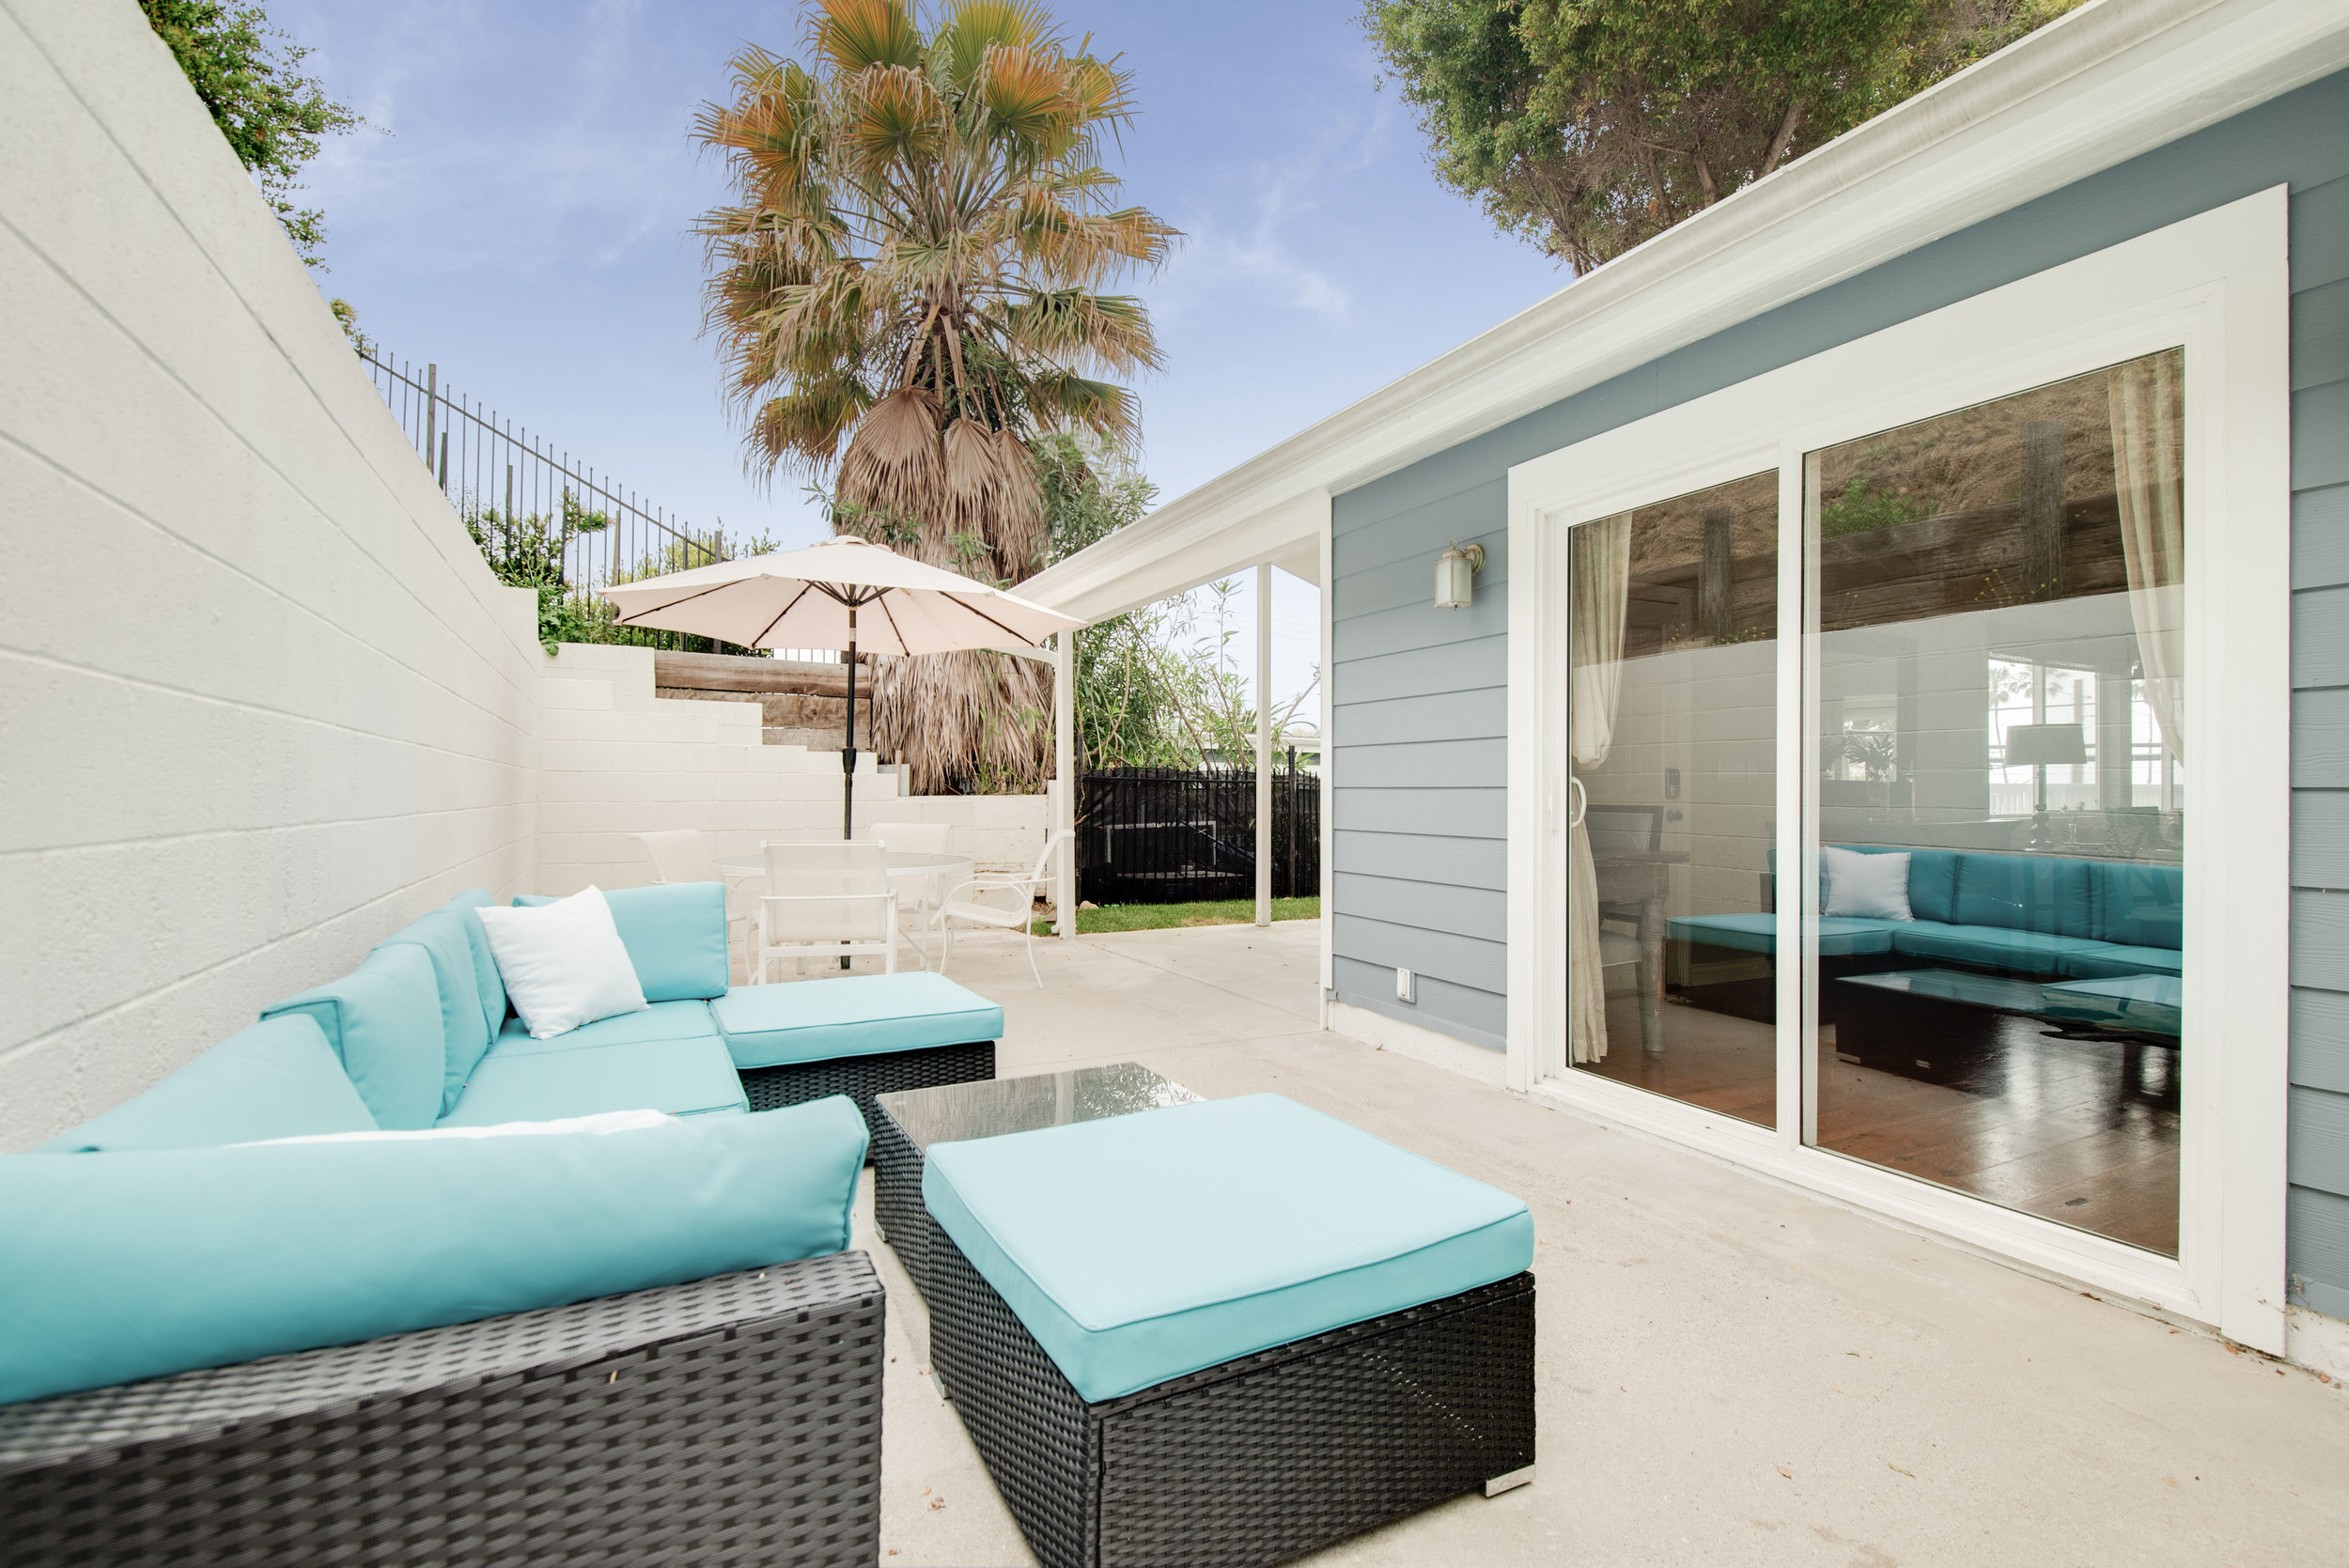 016 Patio 3952 Las Flores For Sale Lease The Malibu Life Team Luxury Real Estate.jpg